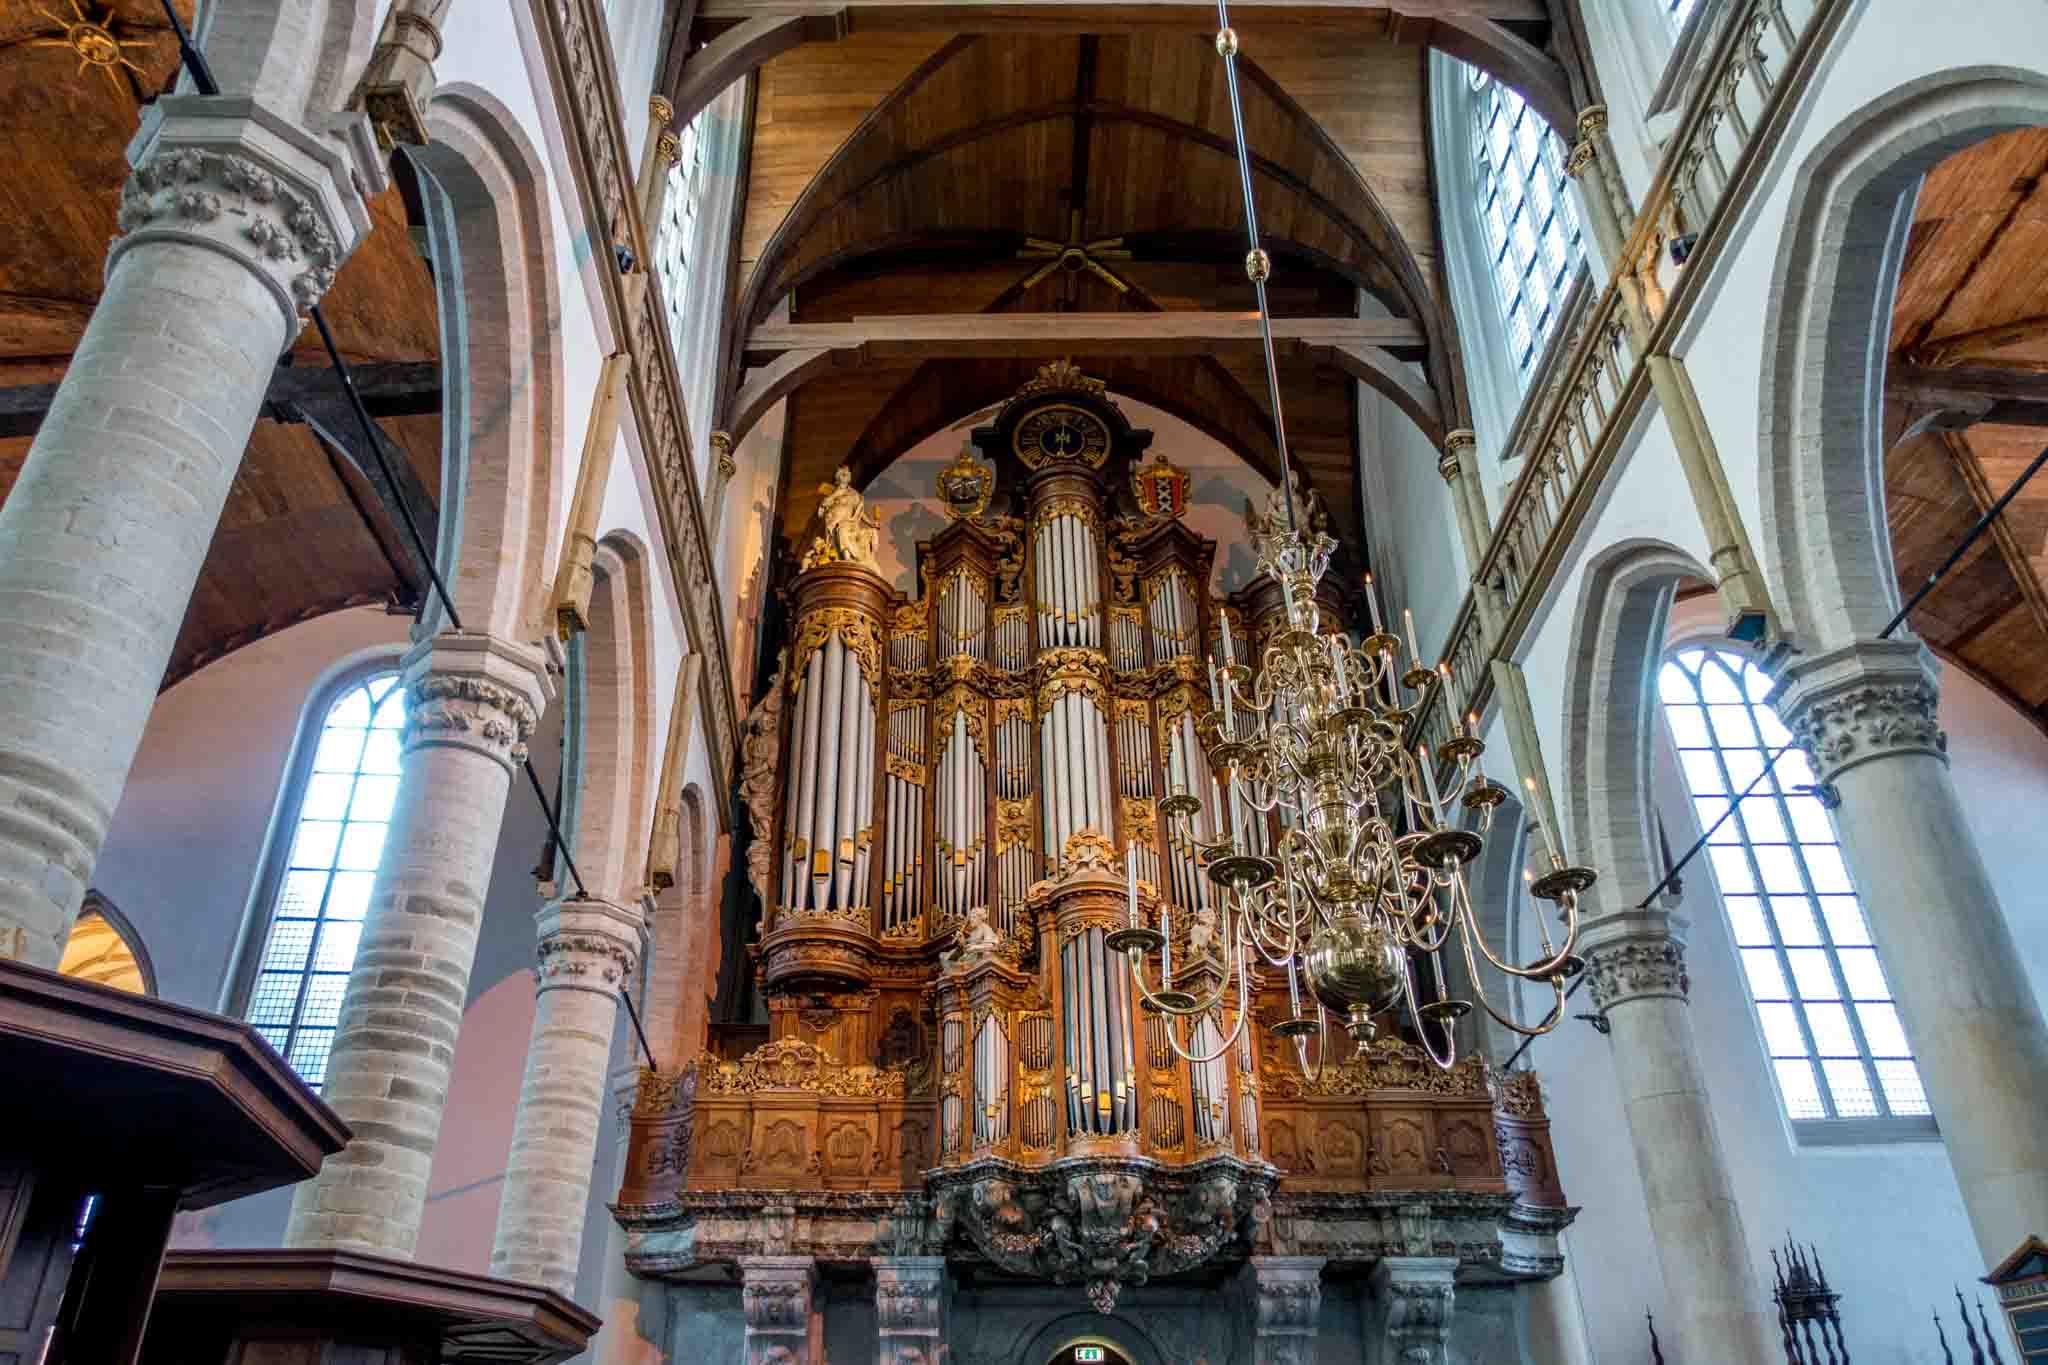 Organ at Oude Kerk, the oldest of the Amsterdam landmarks